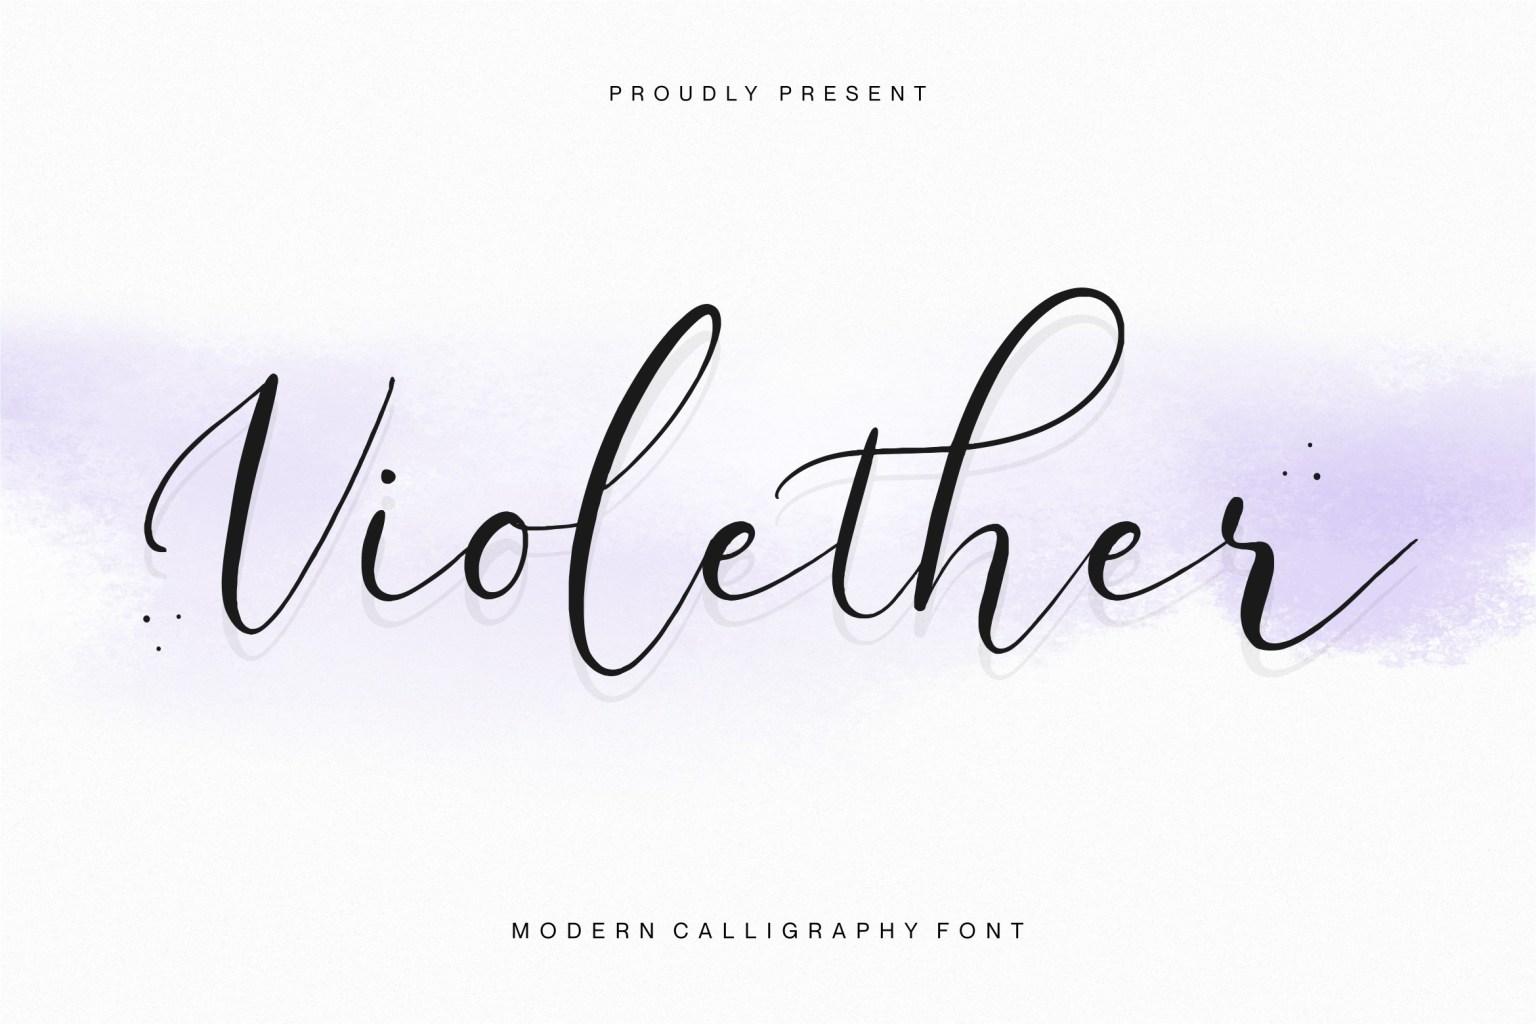 Violether Calligraphy Font